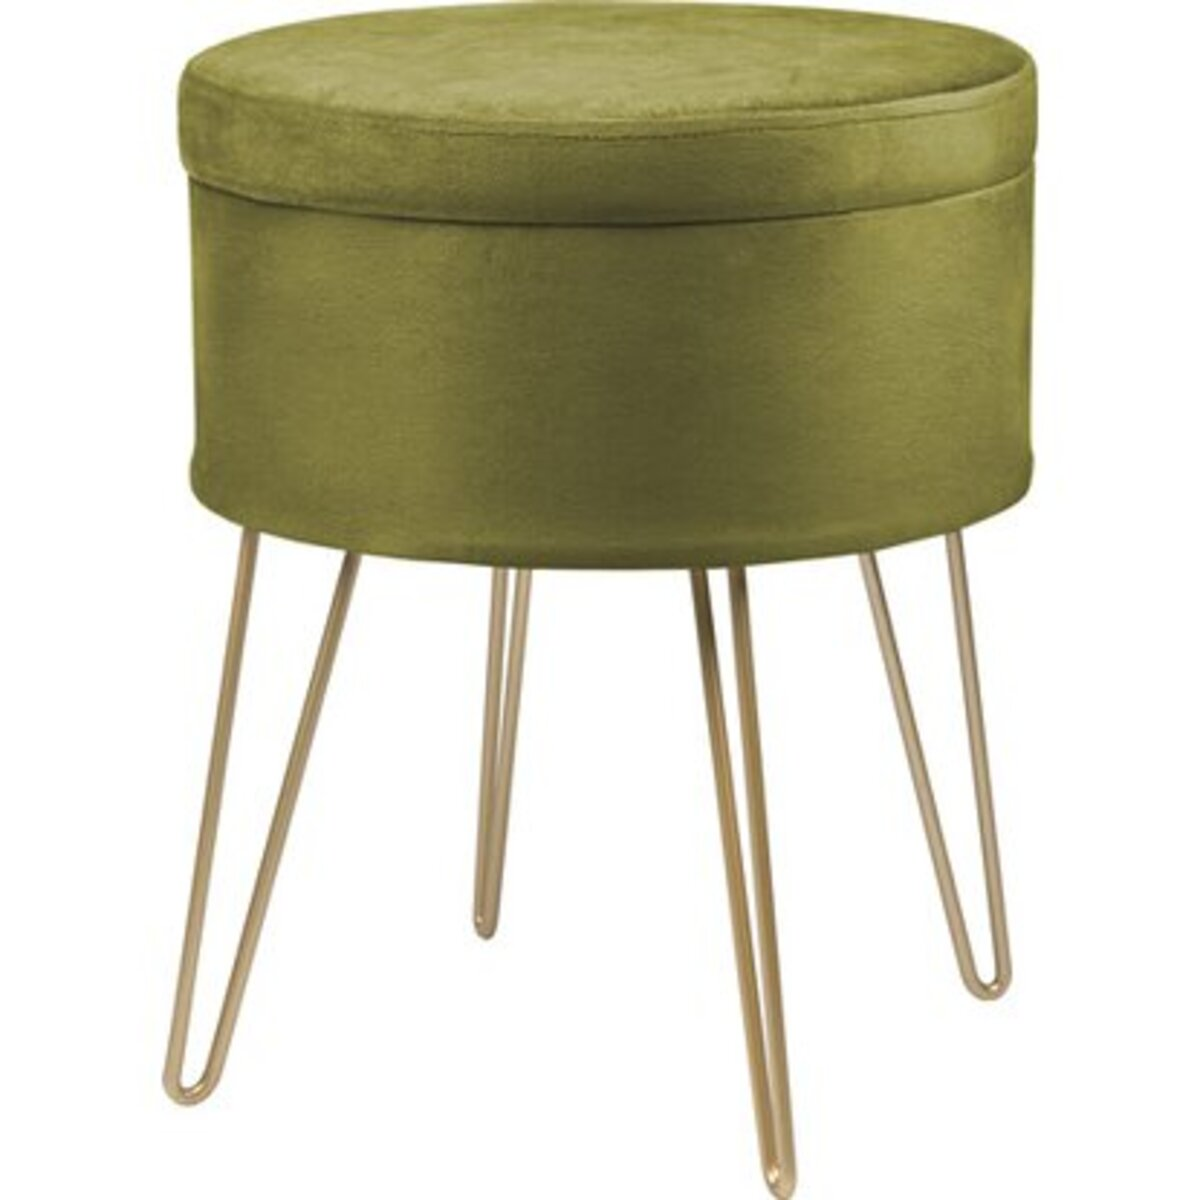 Bild 1 von Sitzhocker Safari Lodge MDF 45 cm x Ø 36 cm Grün